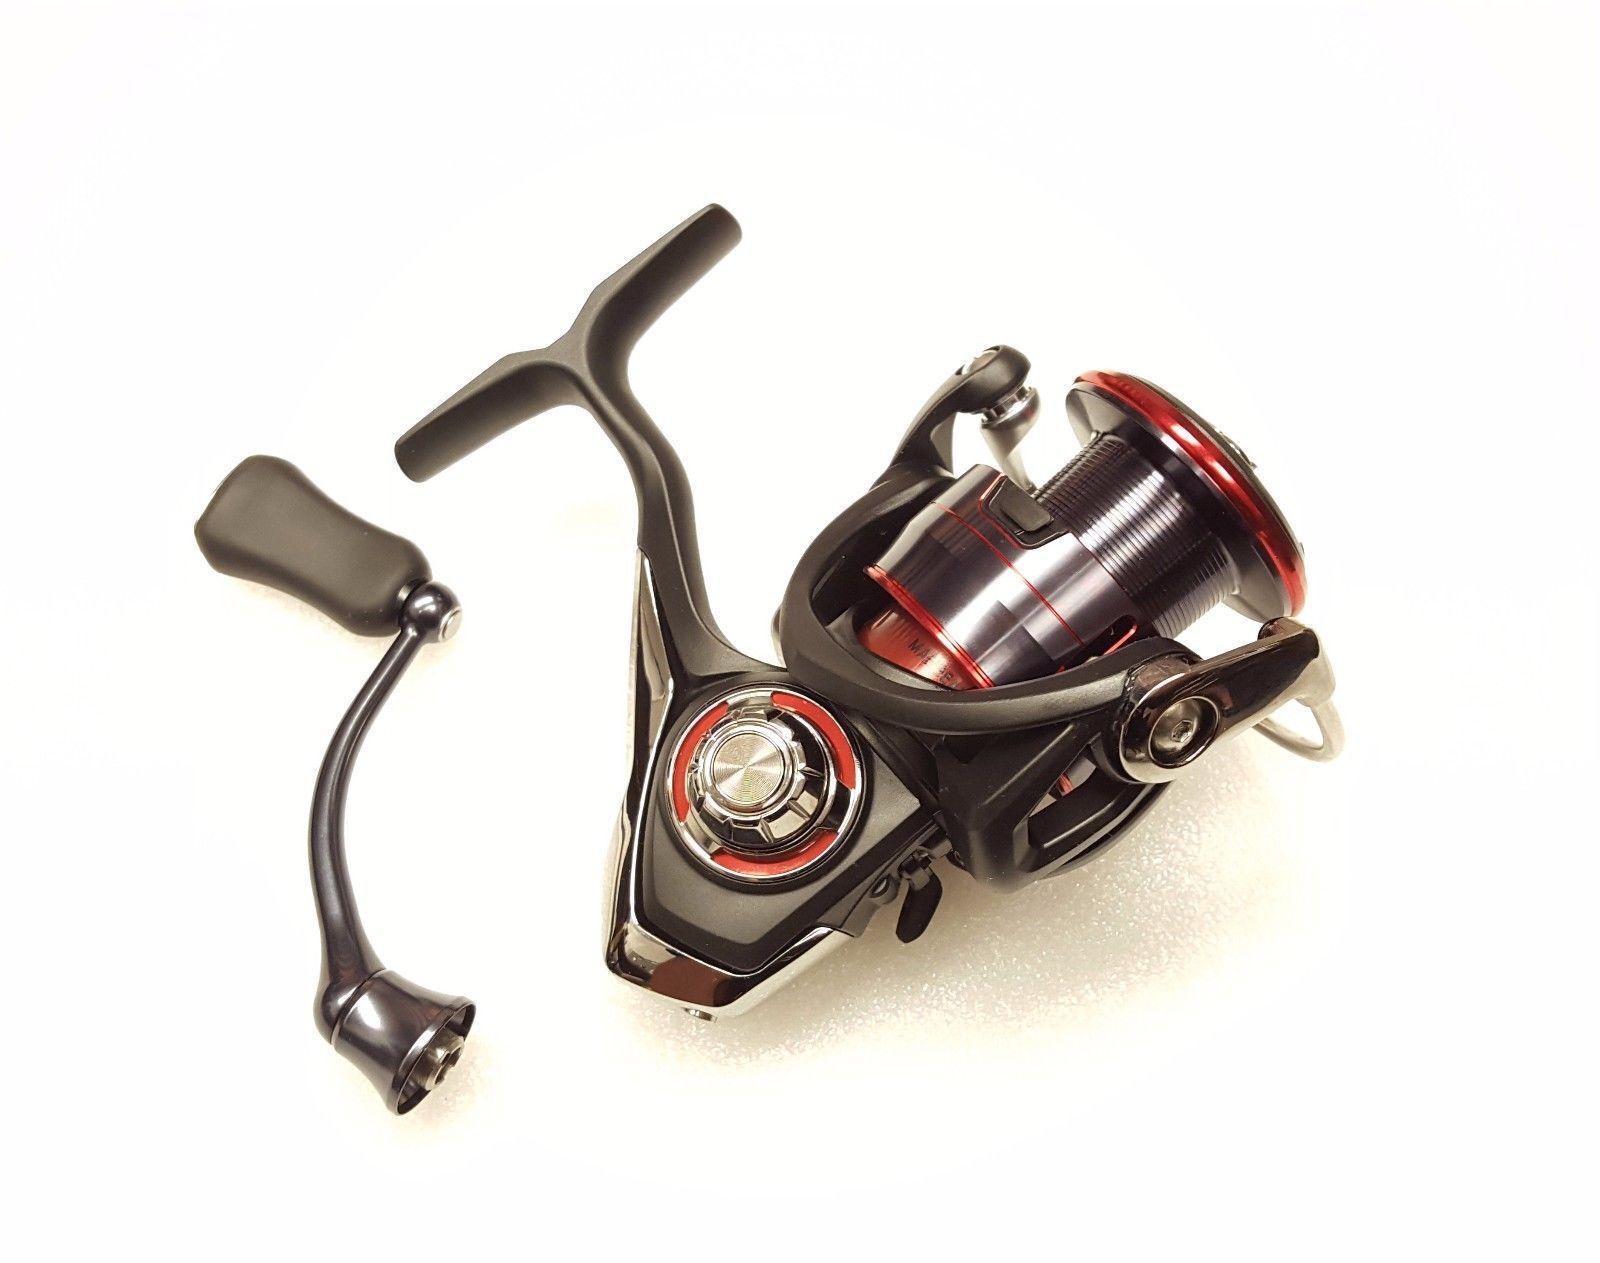 New Daiwa Fuego LT 6.2 1 Left Right Hand Spinning Fishing Reel - FGLT2500D-XH